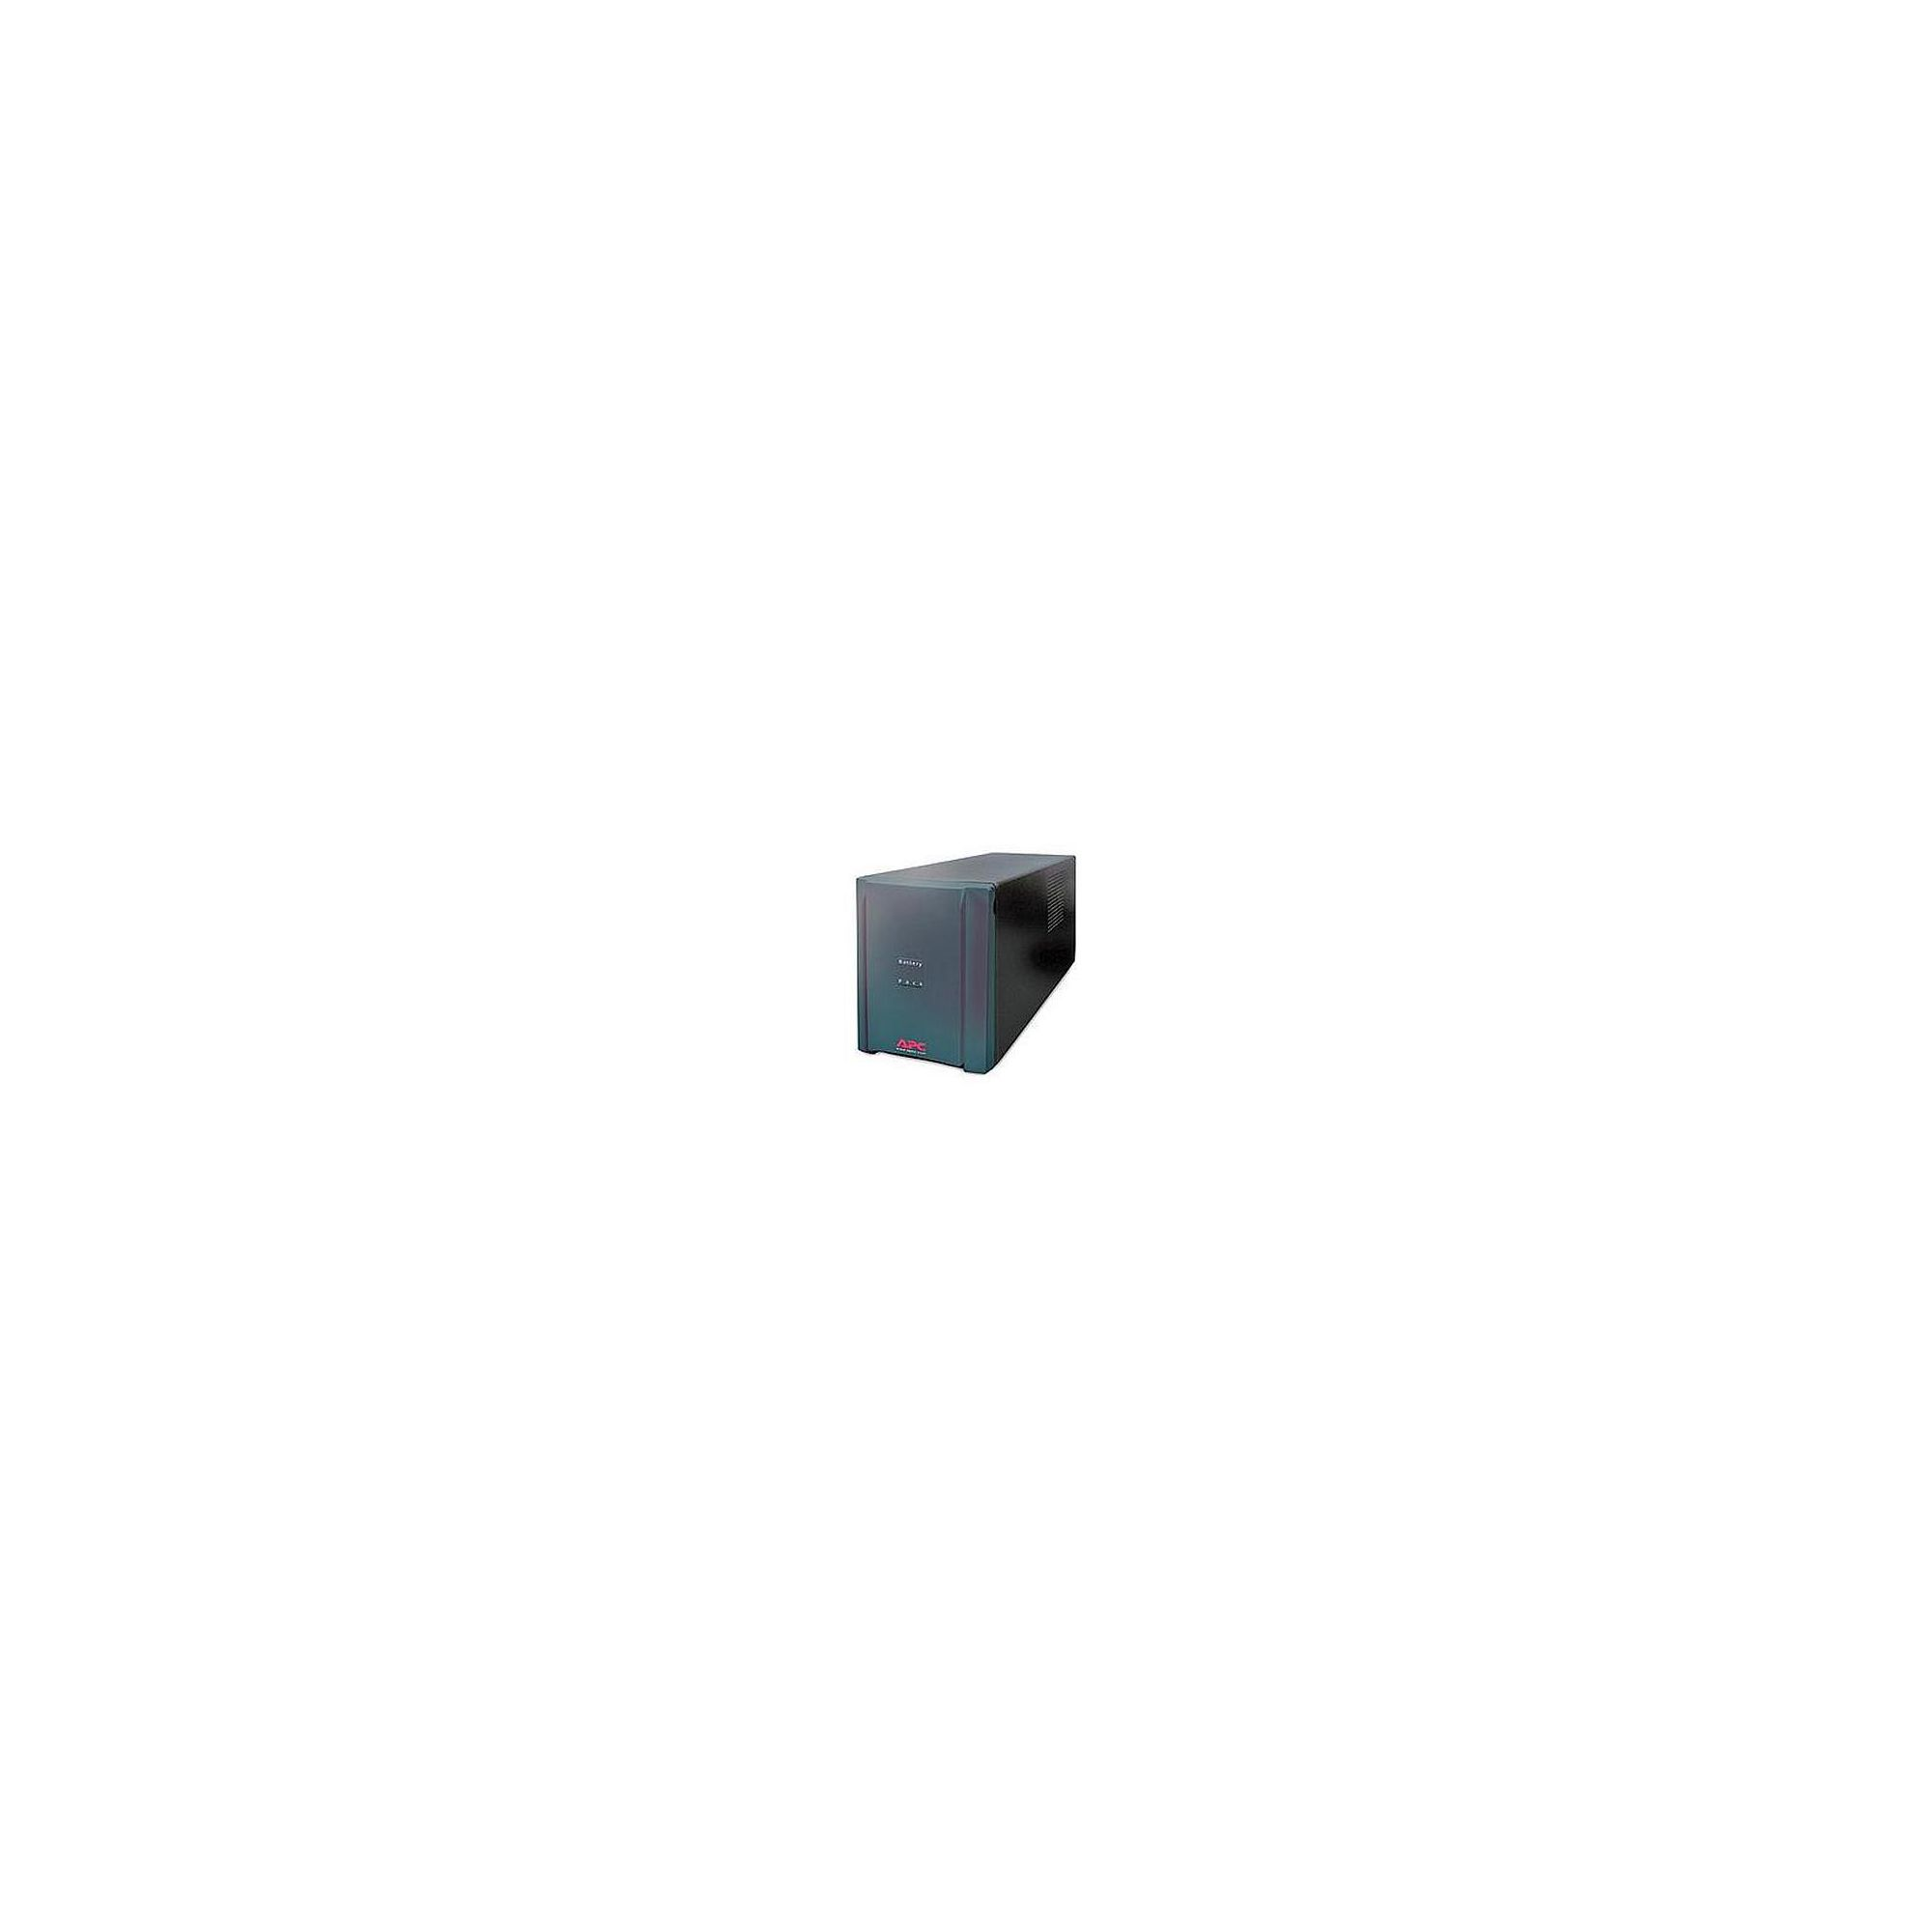 Battery Pack 230V f SUA1000XLI at Tesco Direct